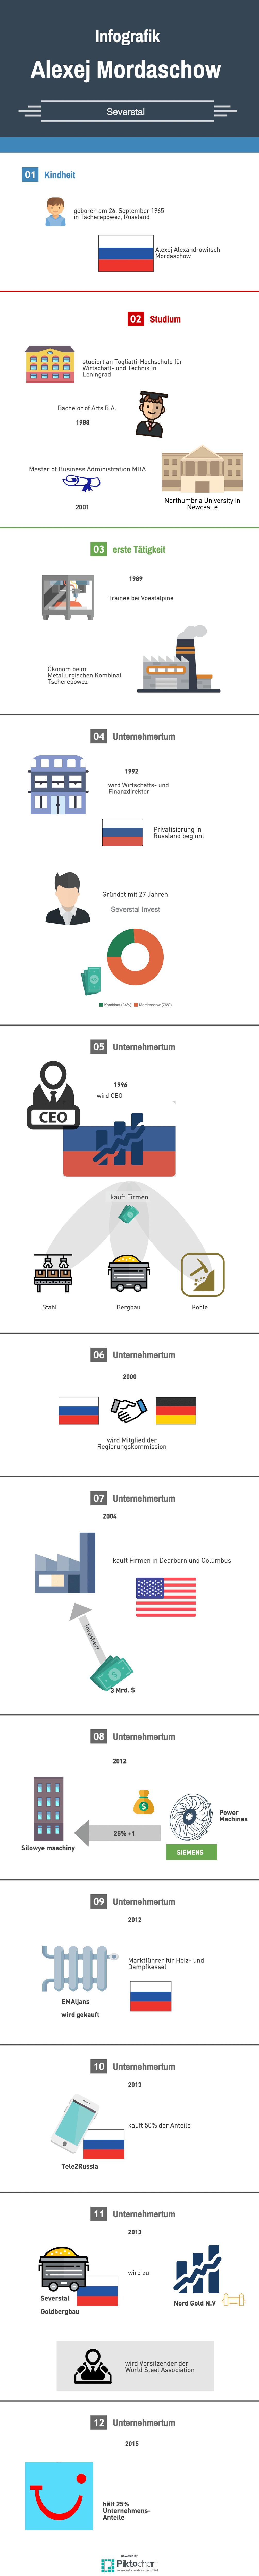 Informationsgrafik über den Milliardär Alexej Mordaschow